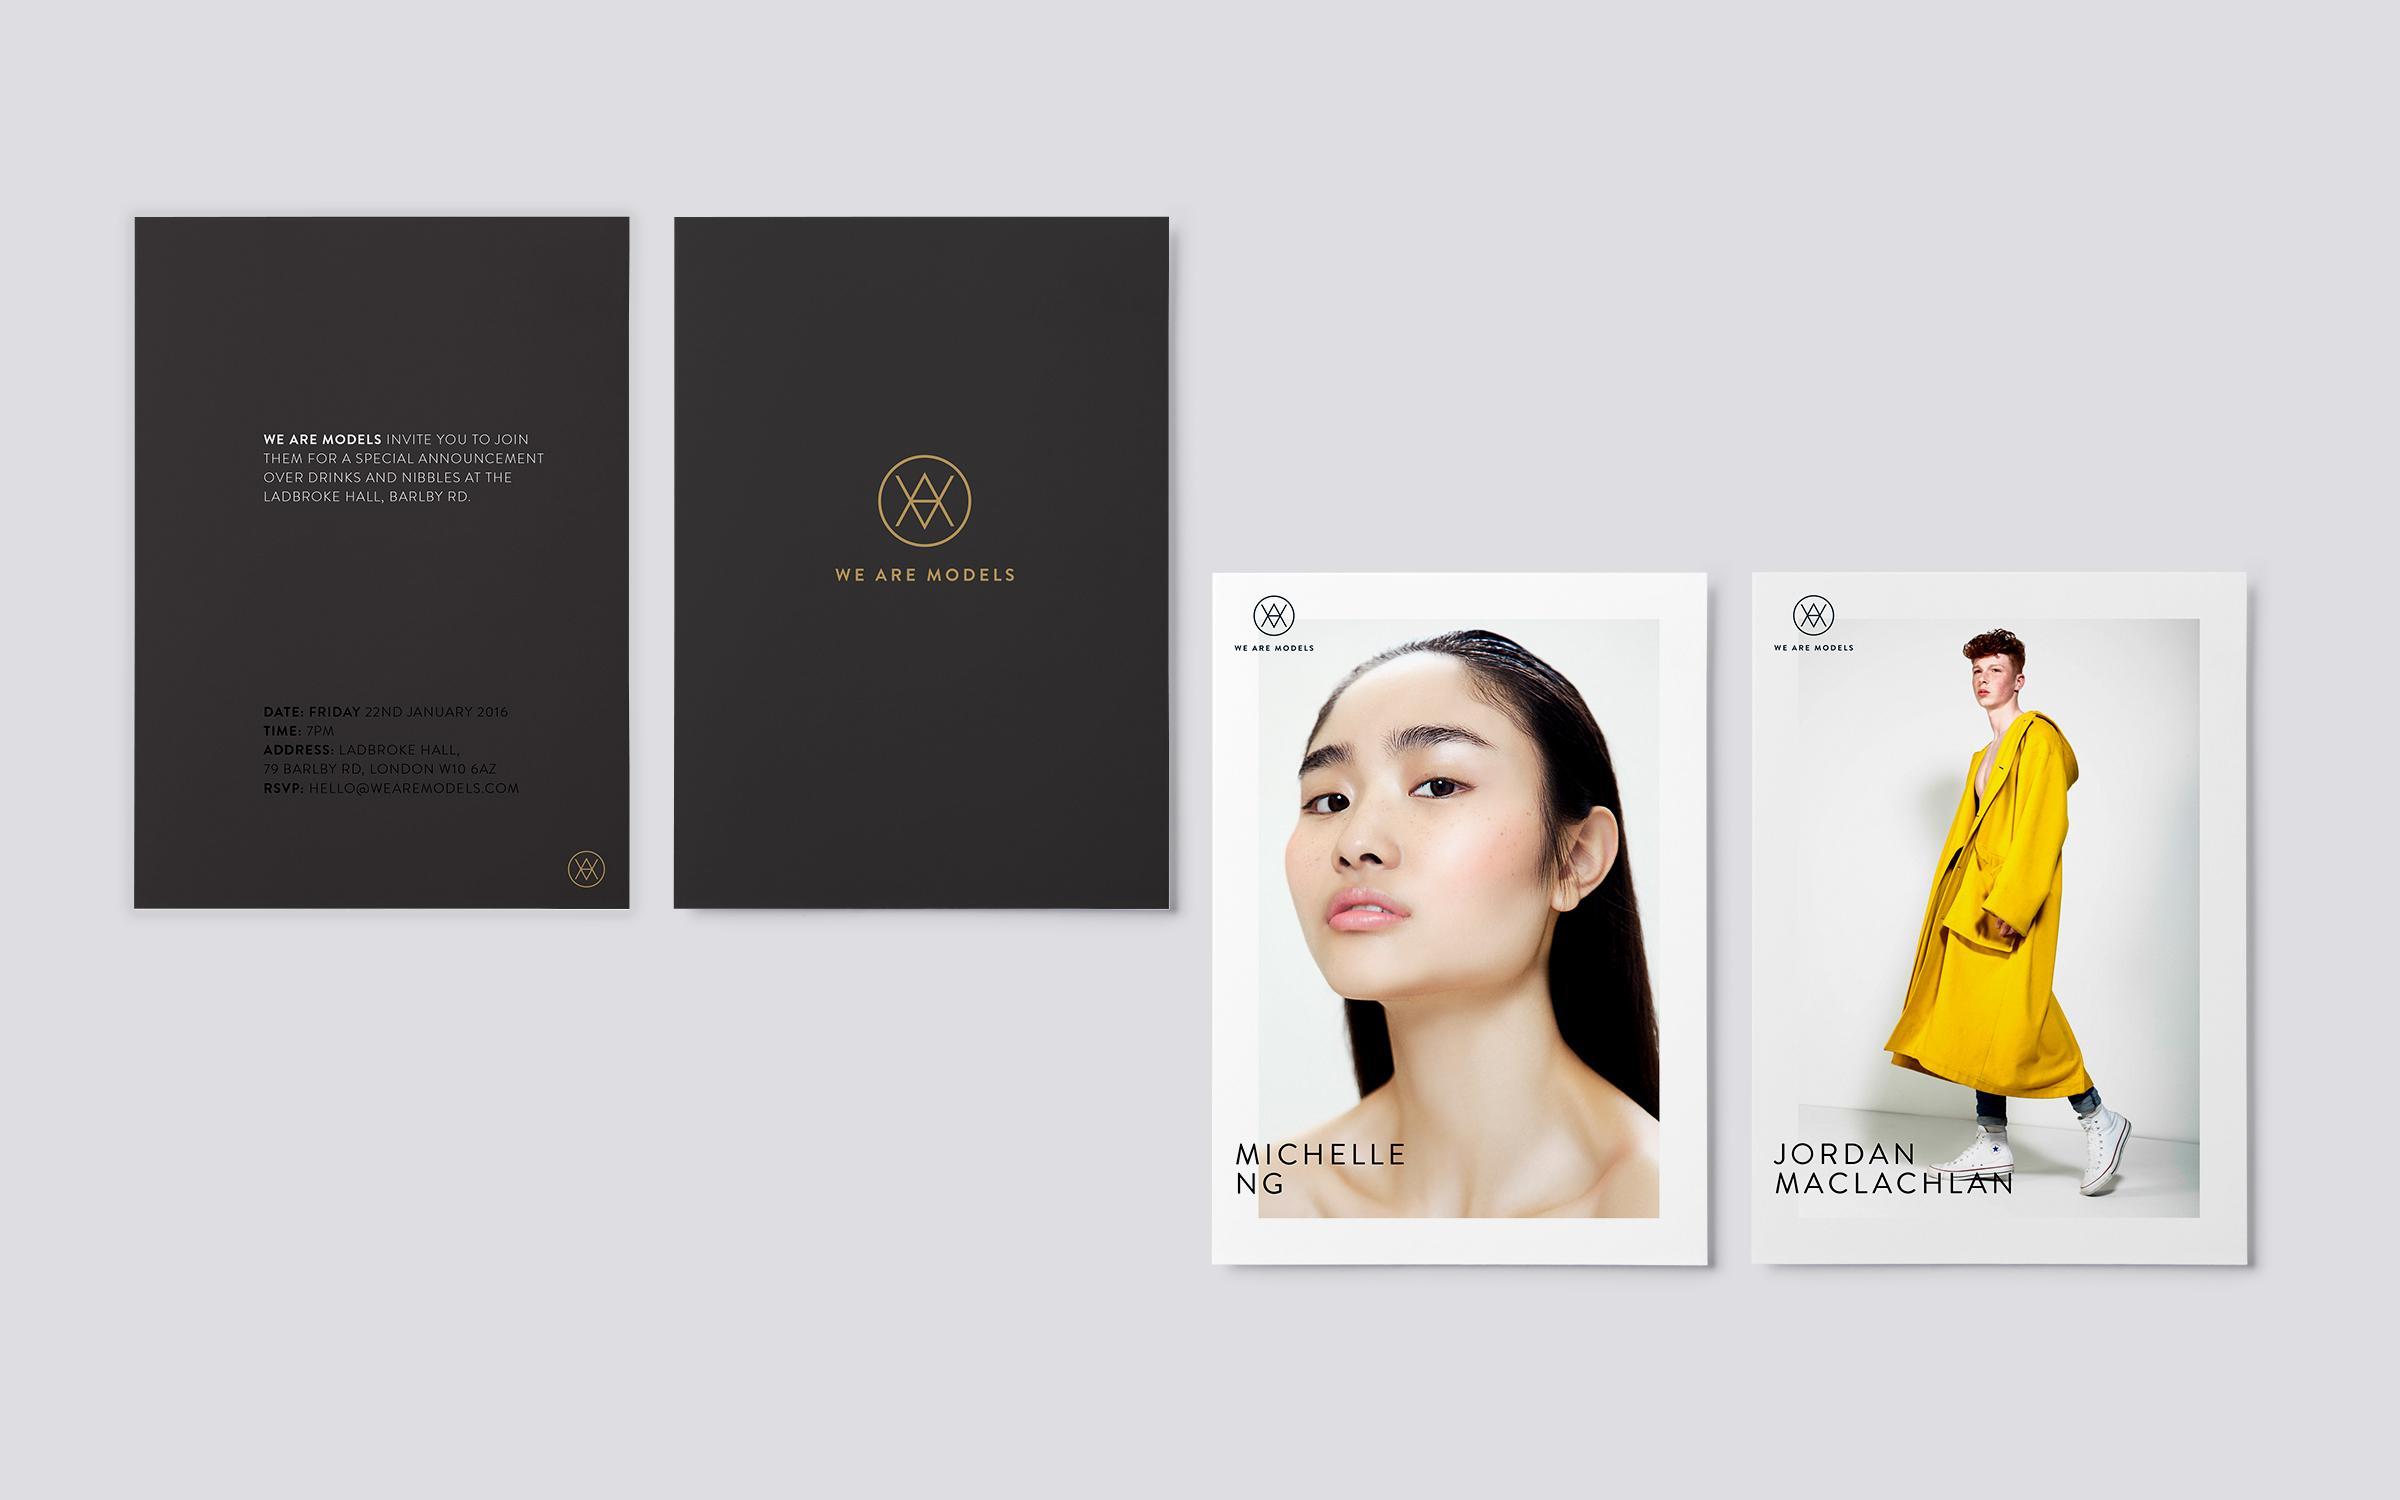 invitations for london fashion brand